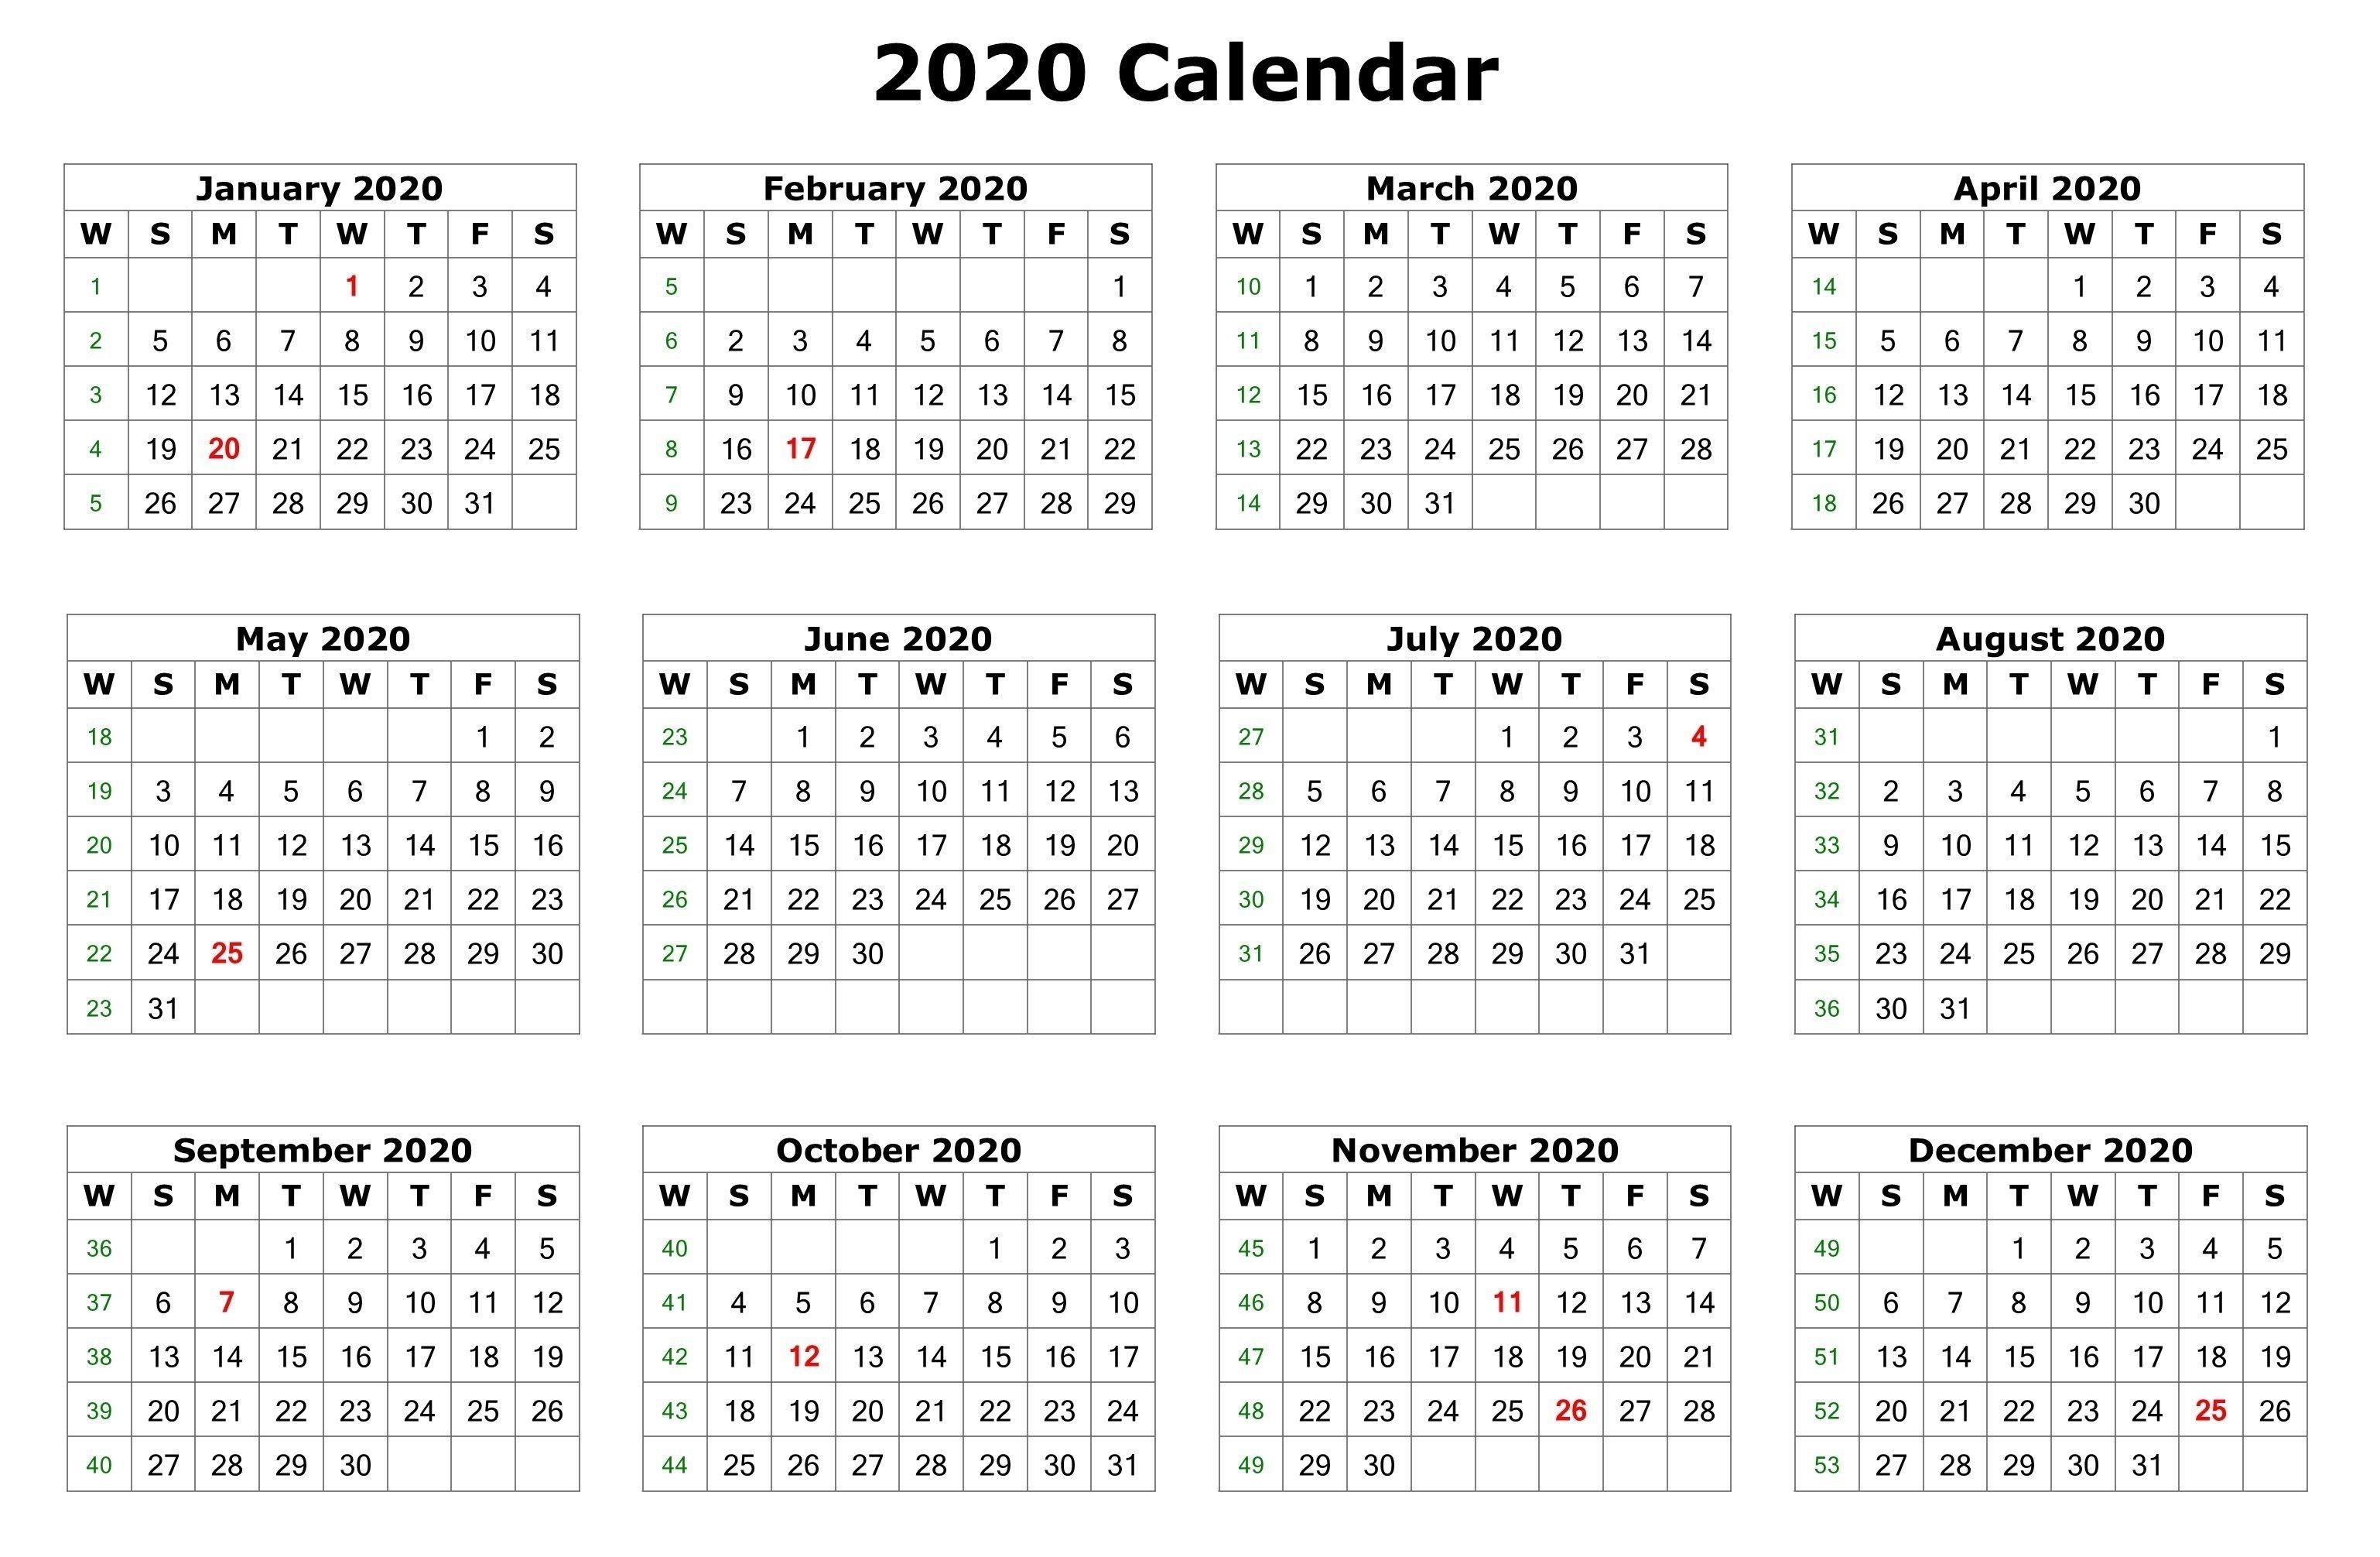 2020 One Page Calendar Printable | Calendar Printables  12 Month Calendar 2020 Printable Free